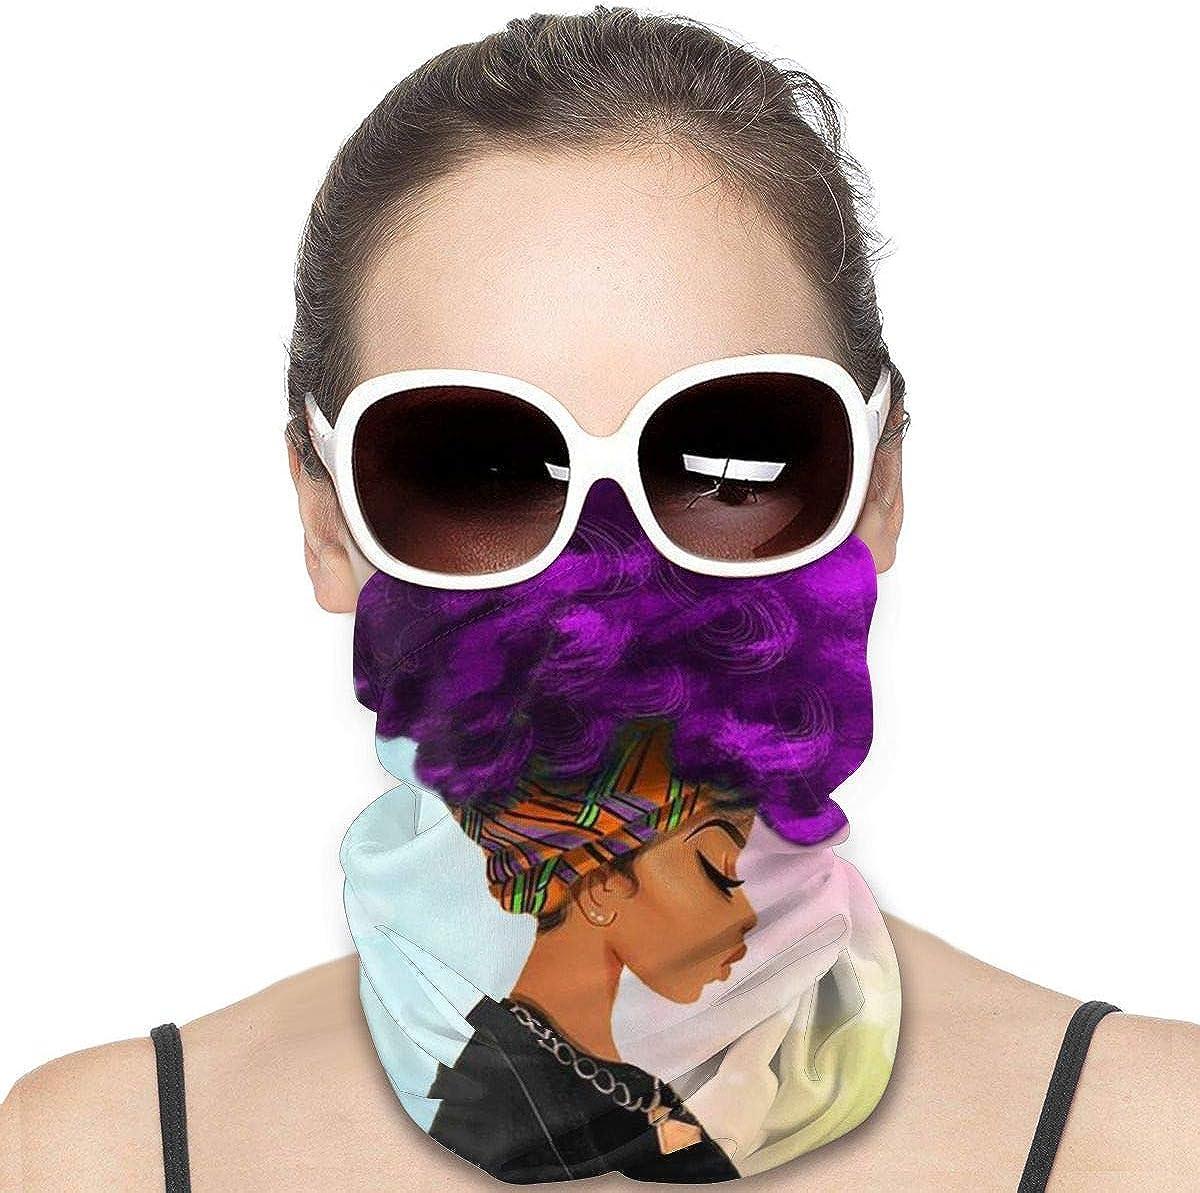 JinSPef Balaclava Sun Protection Face Mask - African American Black Women with Purple Hairs for Men Neck Gaiter Neck Gaiter Head Bands Neck Gaiters for Men Headwear Sun Mask